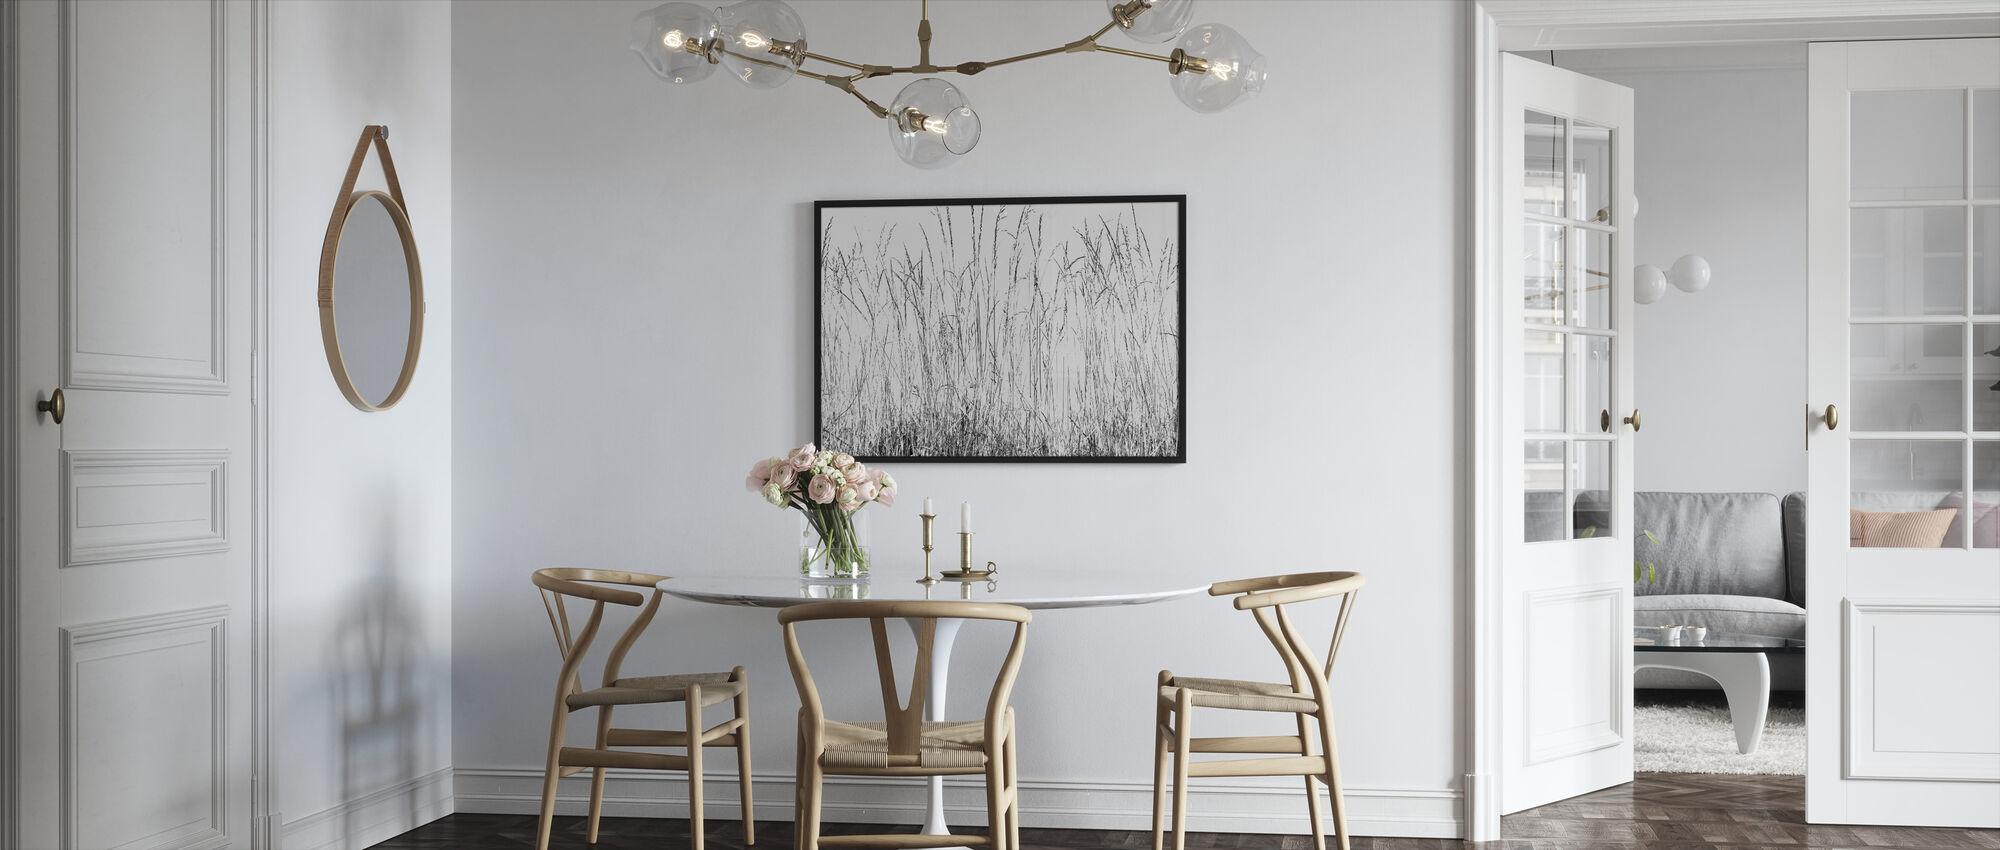 Gras messen bw - Ingelijste print - Keuken